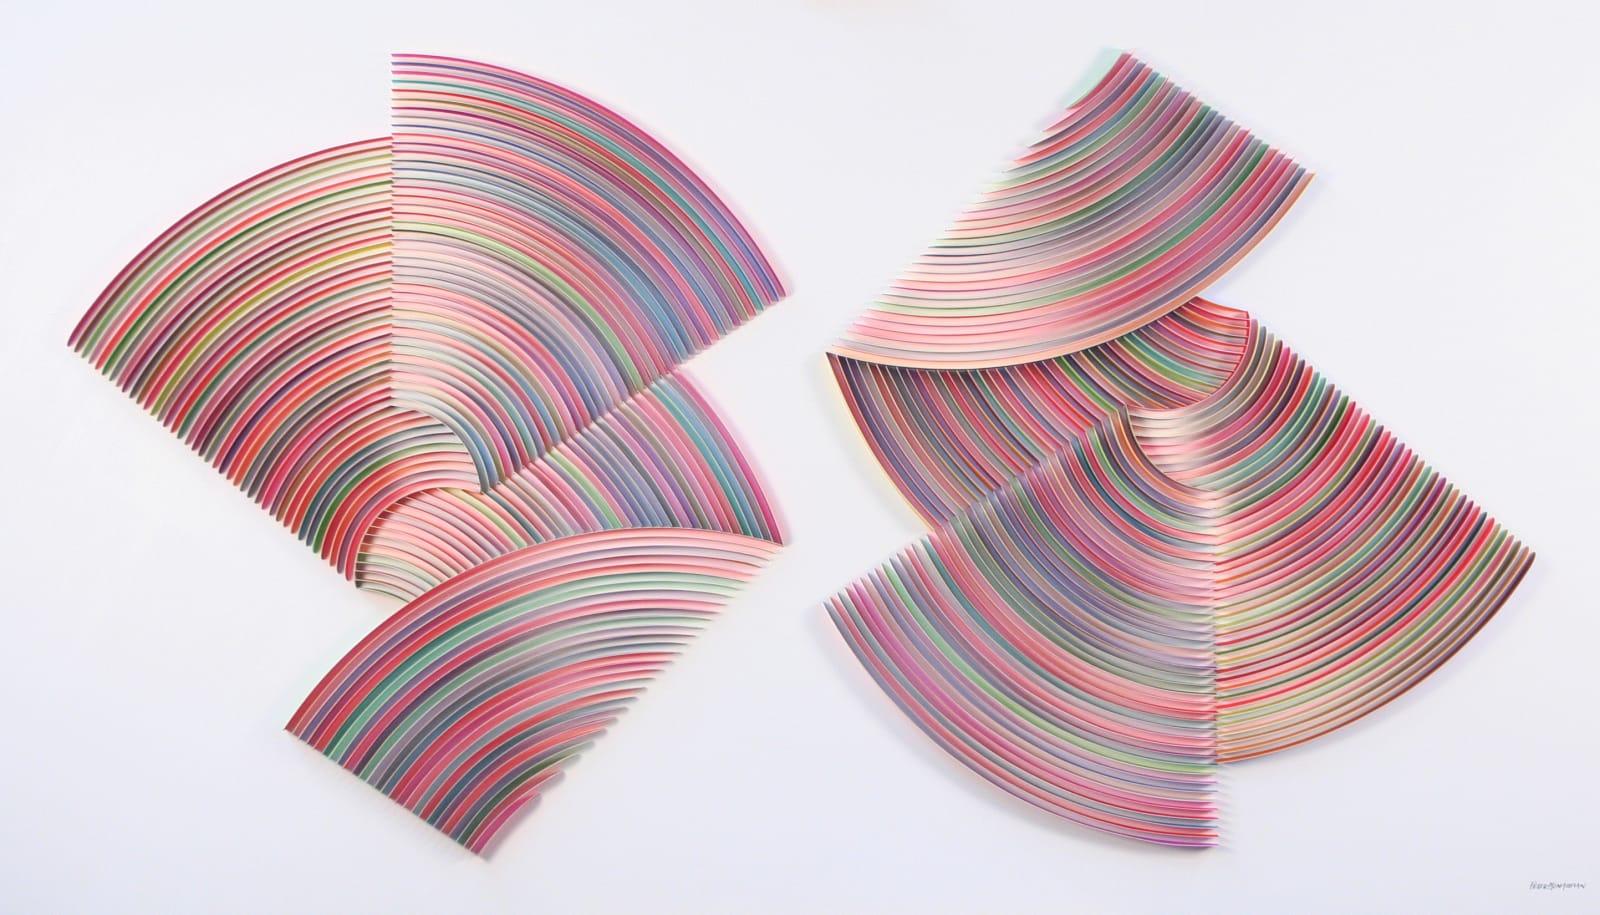 Peter Monaghan, Fold 7, 2020